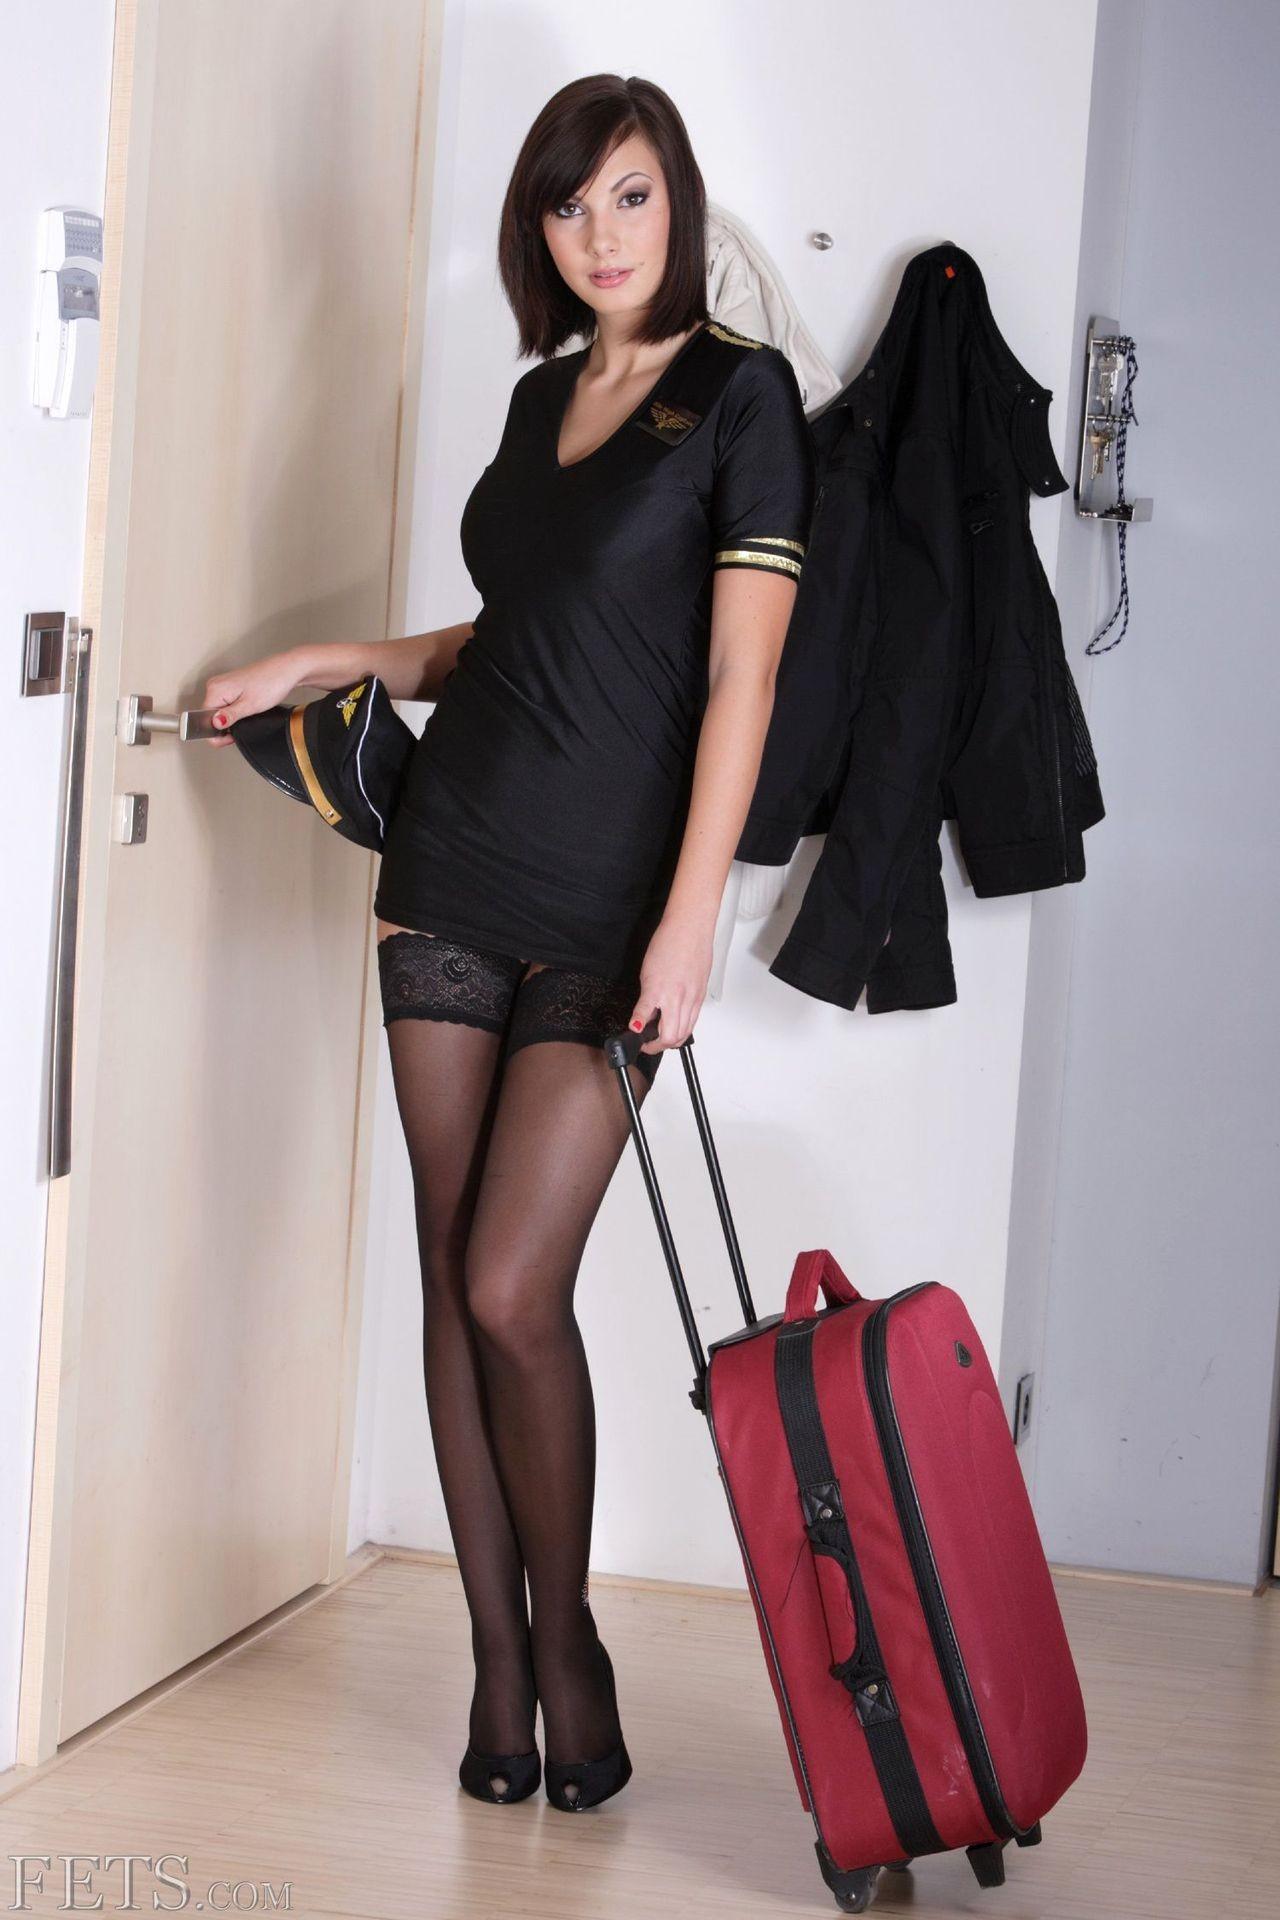 Wallpaper  Brunette, Legs, Hat, High Heels, Stockings, Black Hair, Feet, Fashion -9102